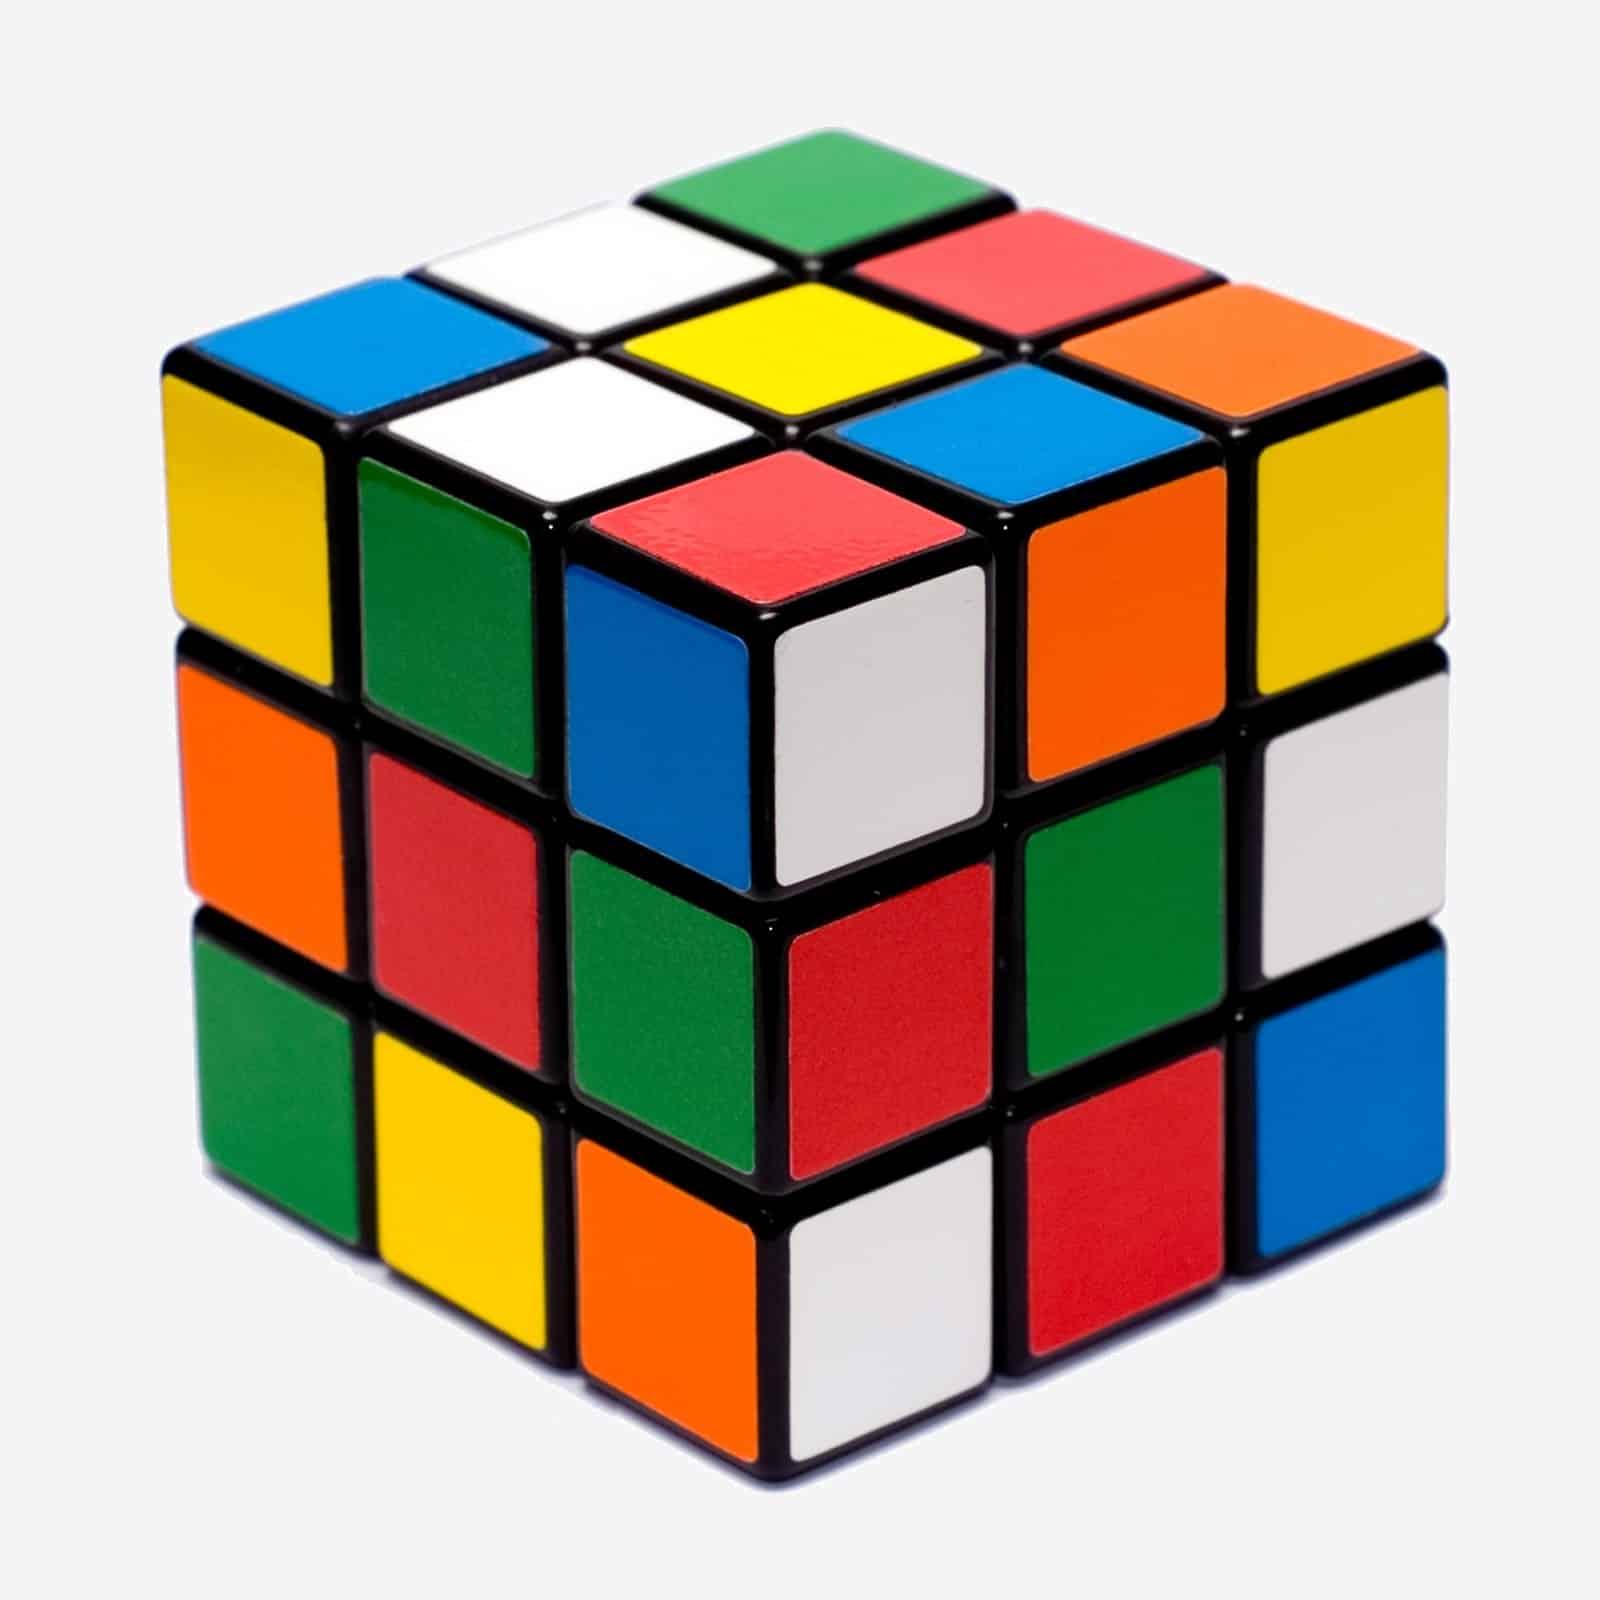 Image Rubik's cube